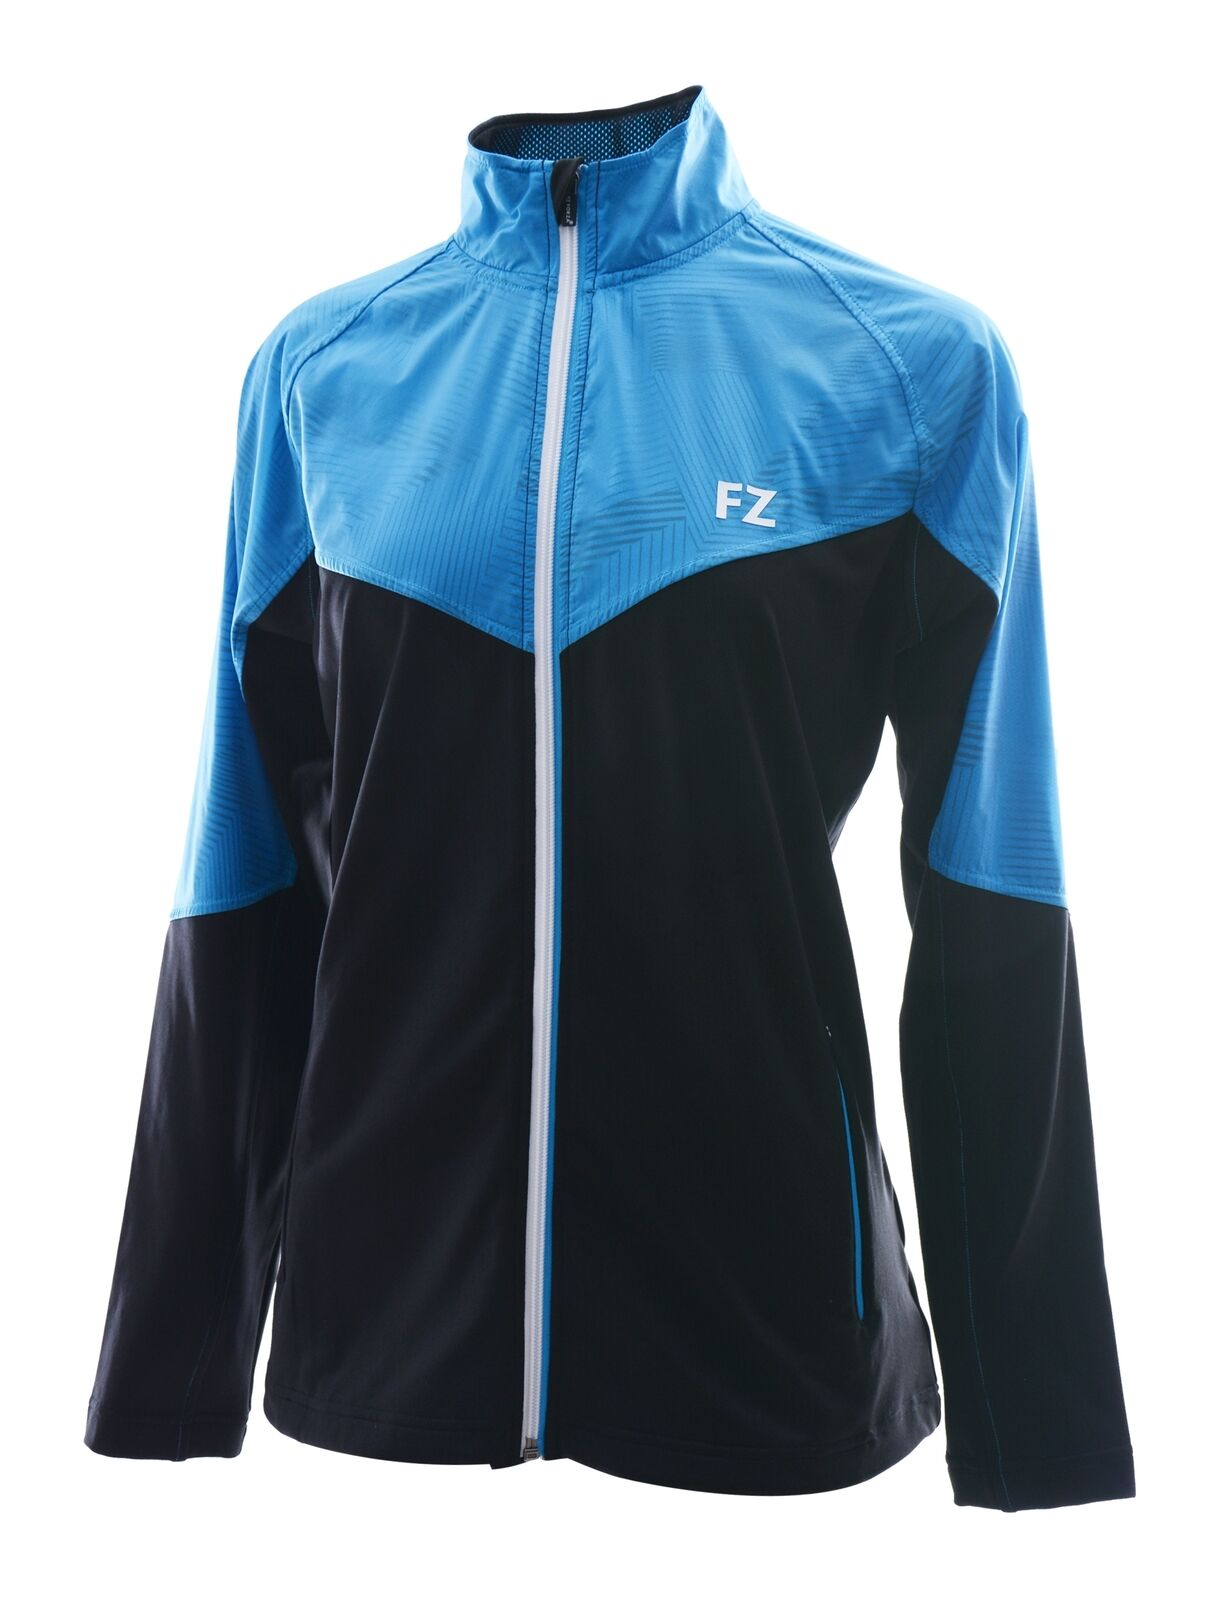 Forza daSie chaqueta CONCORDIA B composite 65533;65533; dminton tenis de MESA daSie Hembra daSie